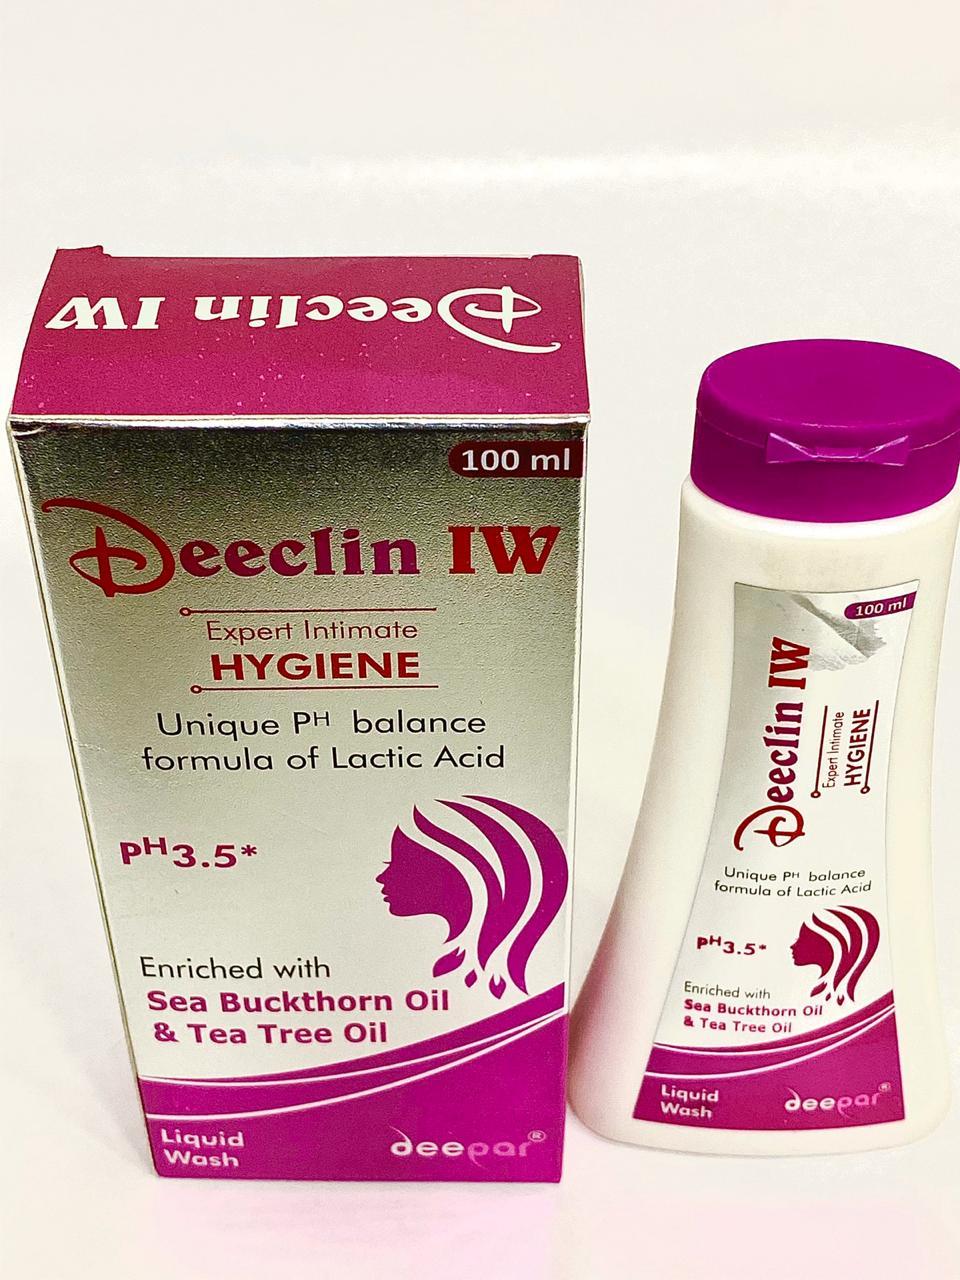 DEECLIN IW